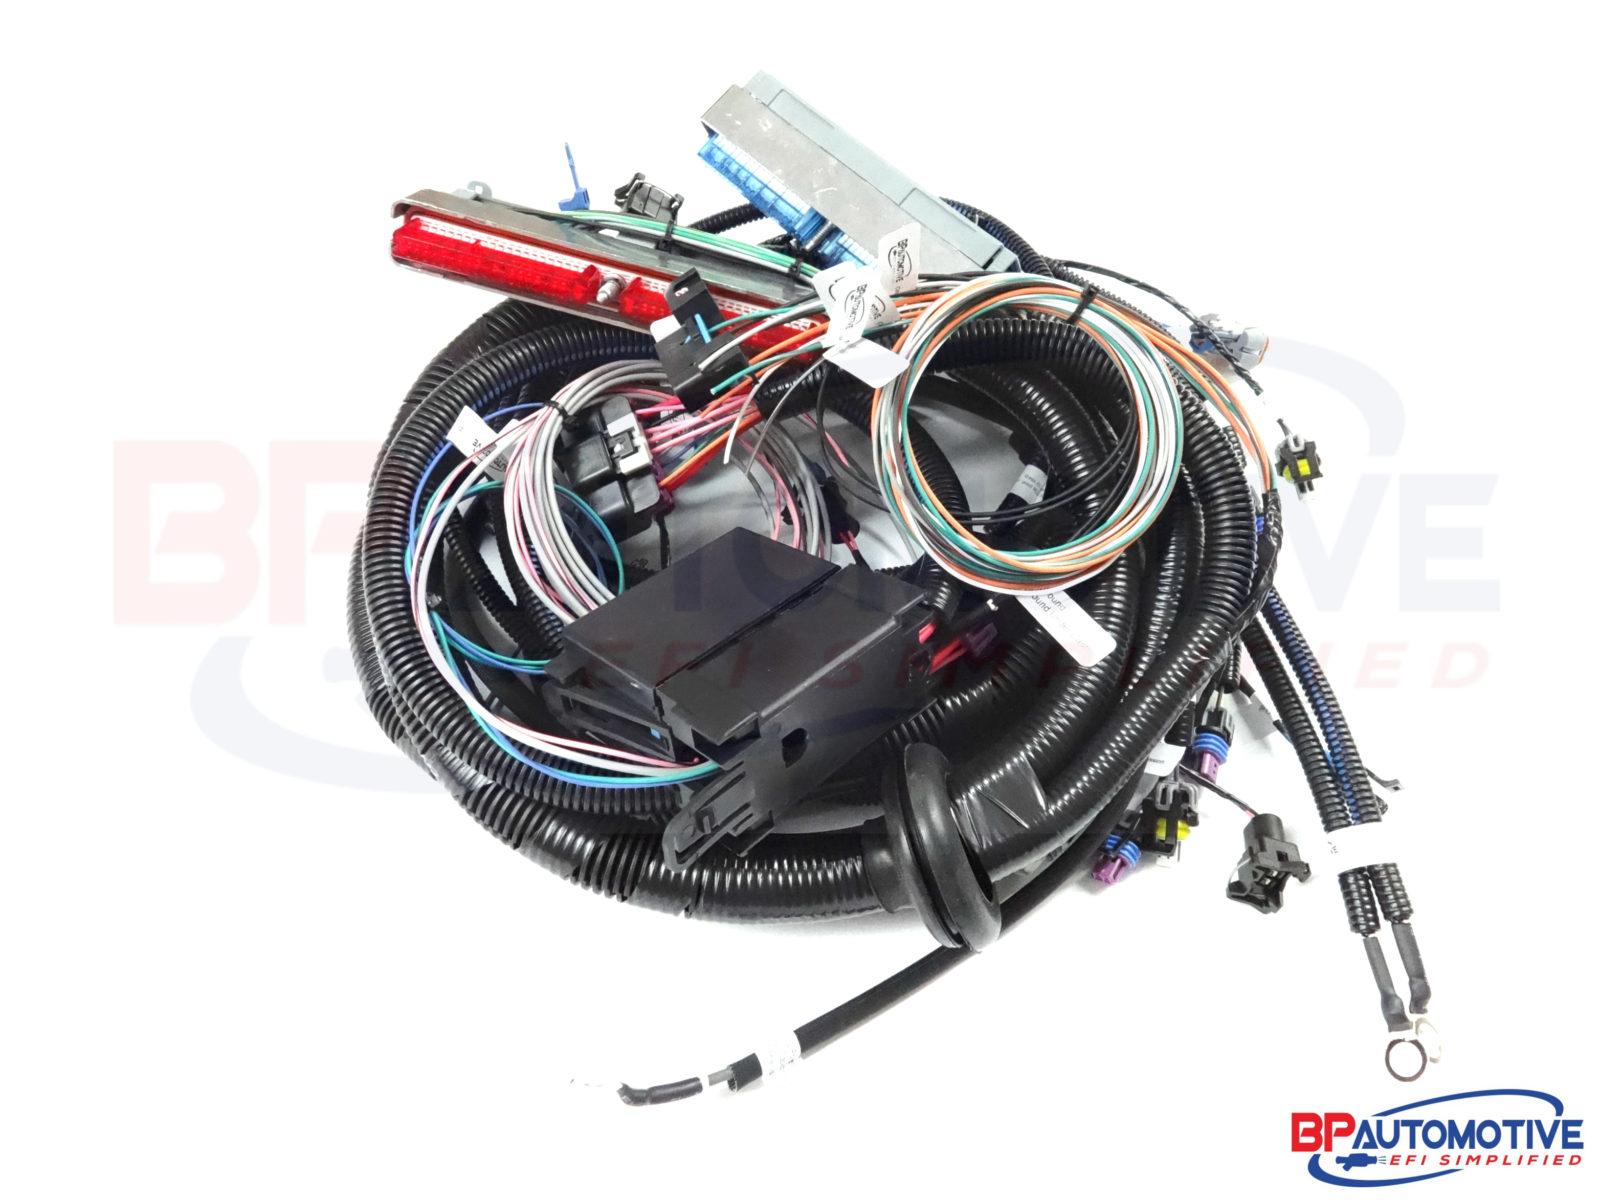 4l80e Standalone Wiring Reinvent Your Diagram Internal Harness 1999 2002 Dbc Vortec With Transmission Rh Bp Automotive Com Valve Body